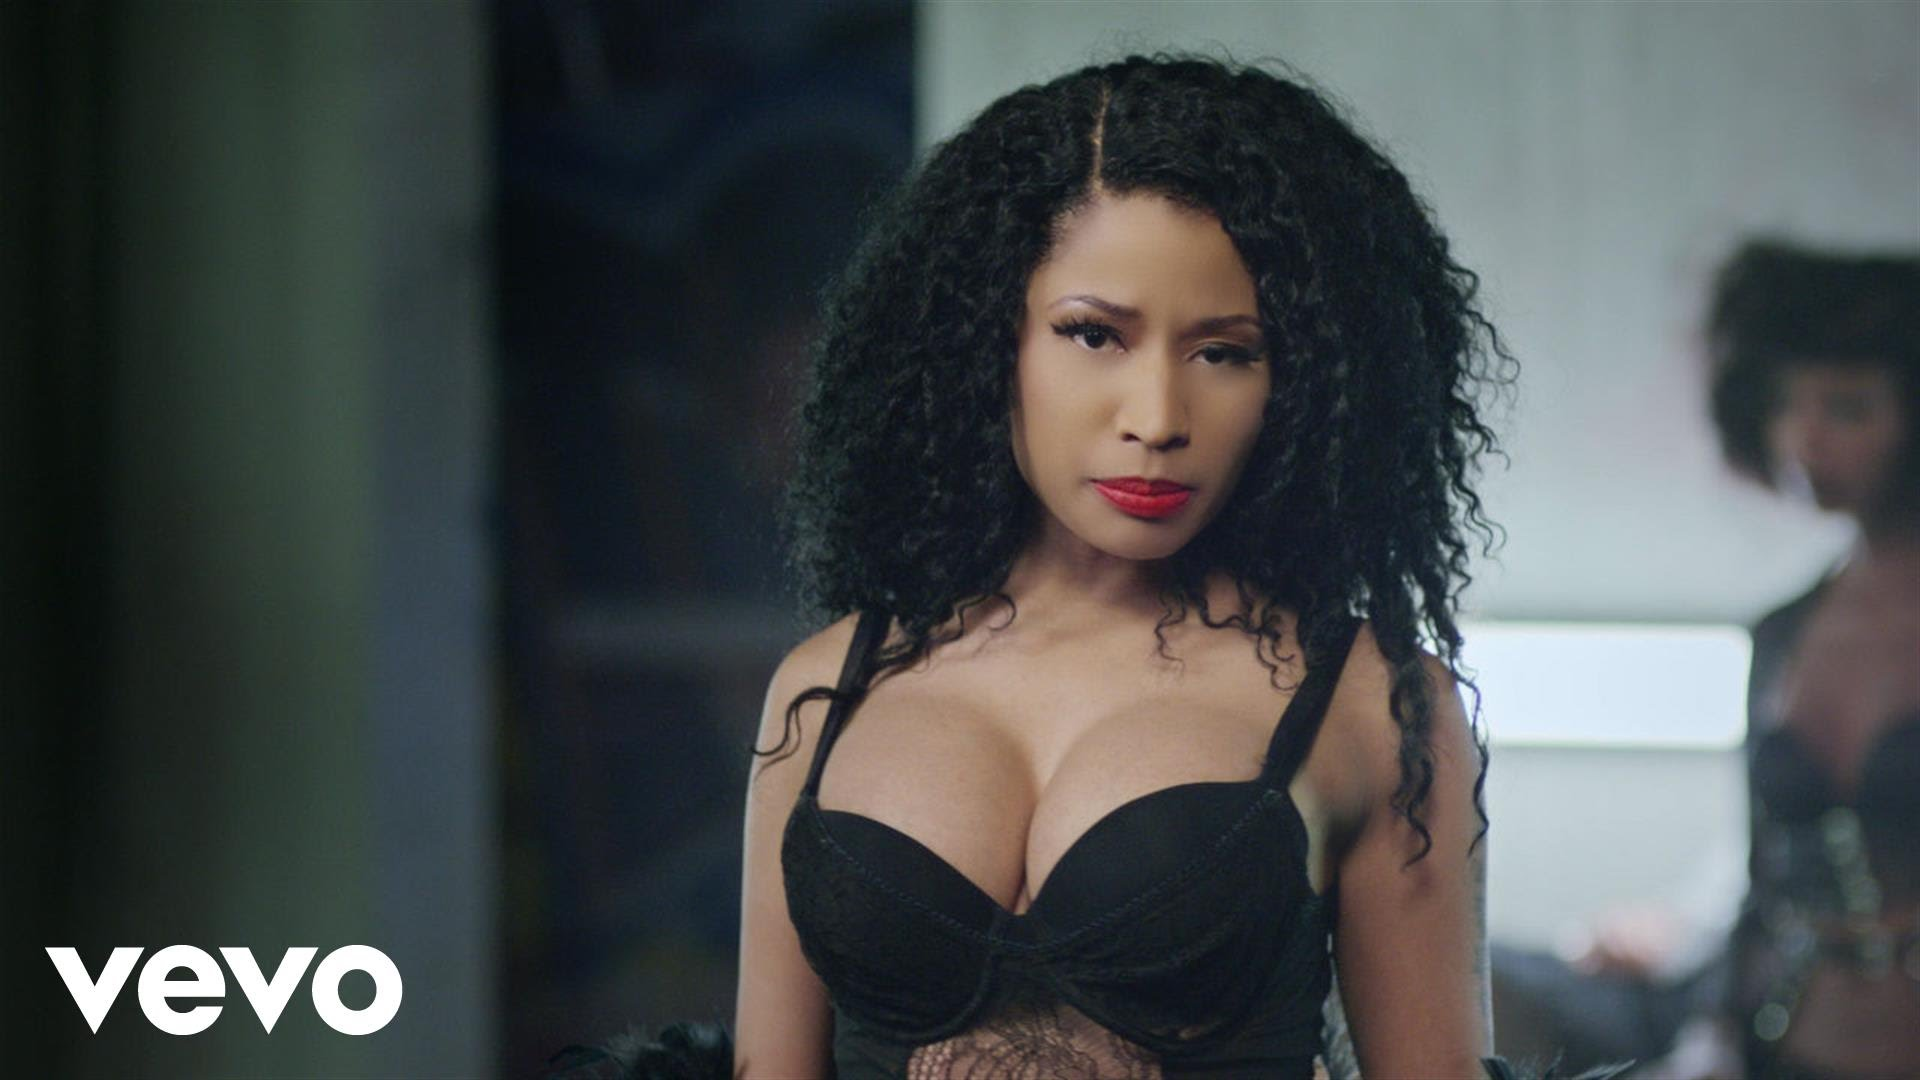 Nicki Minaj Wallpapers hd